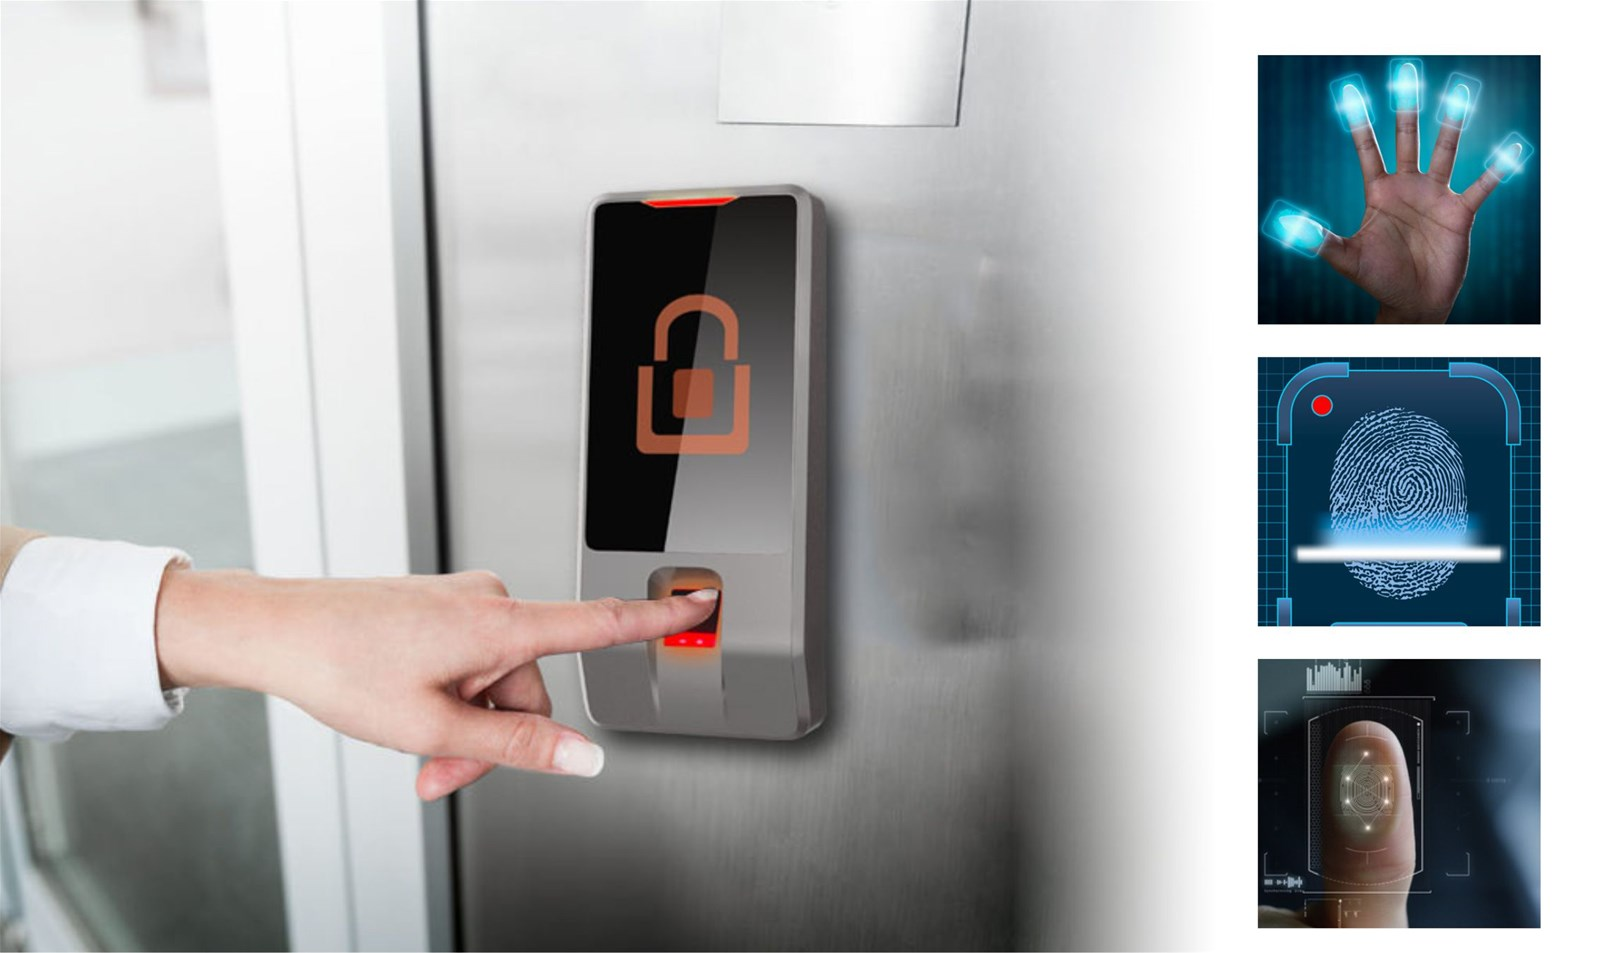 Wholesale Waterproof IP64 Biometric Touch Sensor Fingerprint Recognition Unlock LED display Integrated Access Control